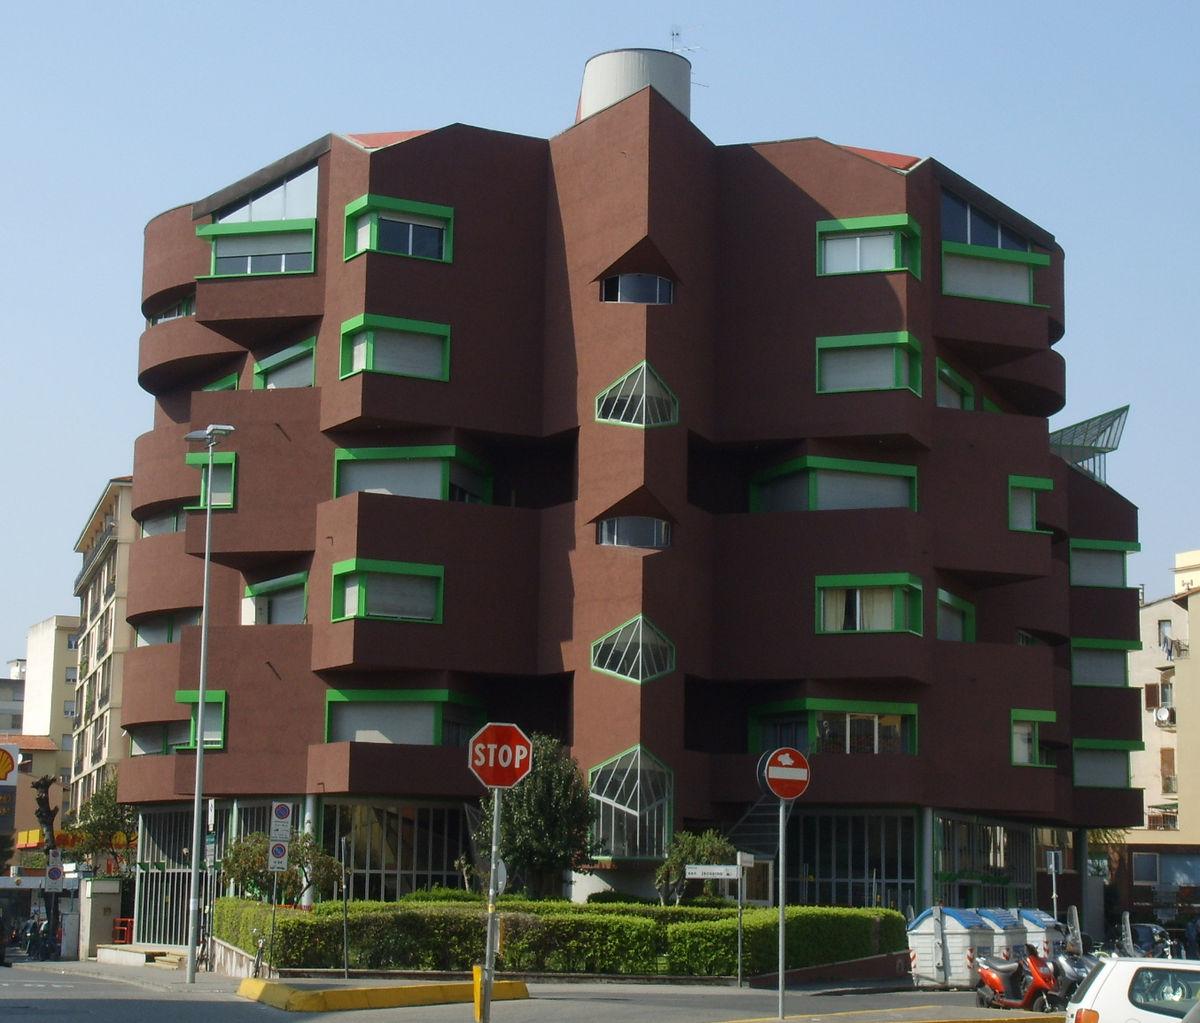 Condominio in san jacopino wikipedia - Vicini di casa rumorosi ...